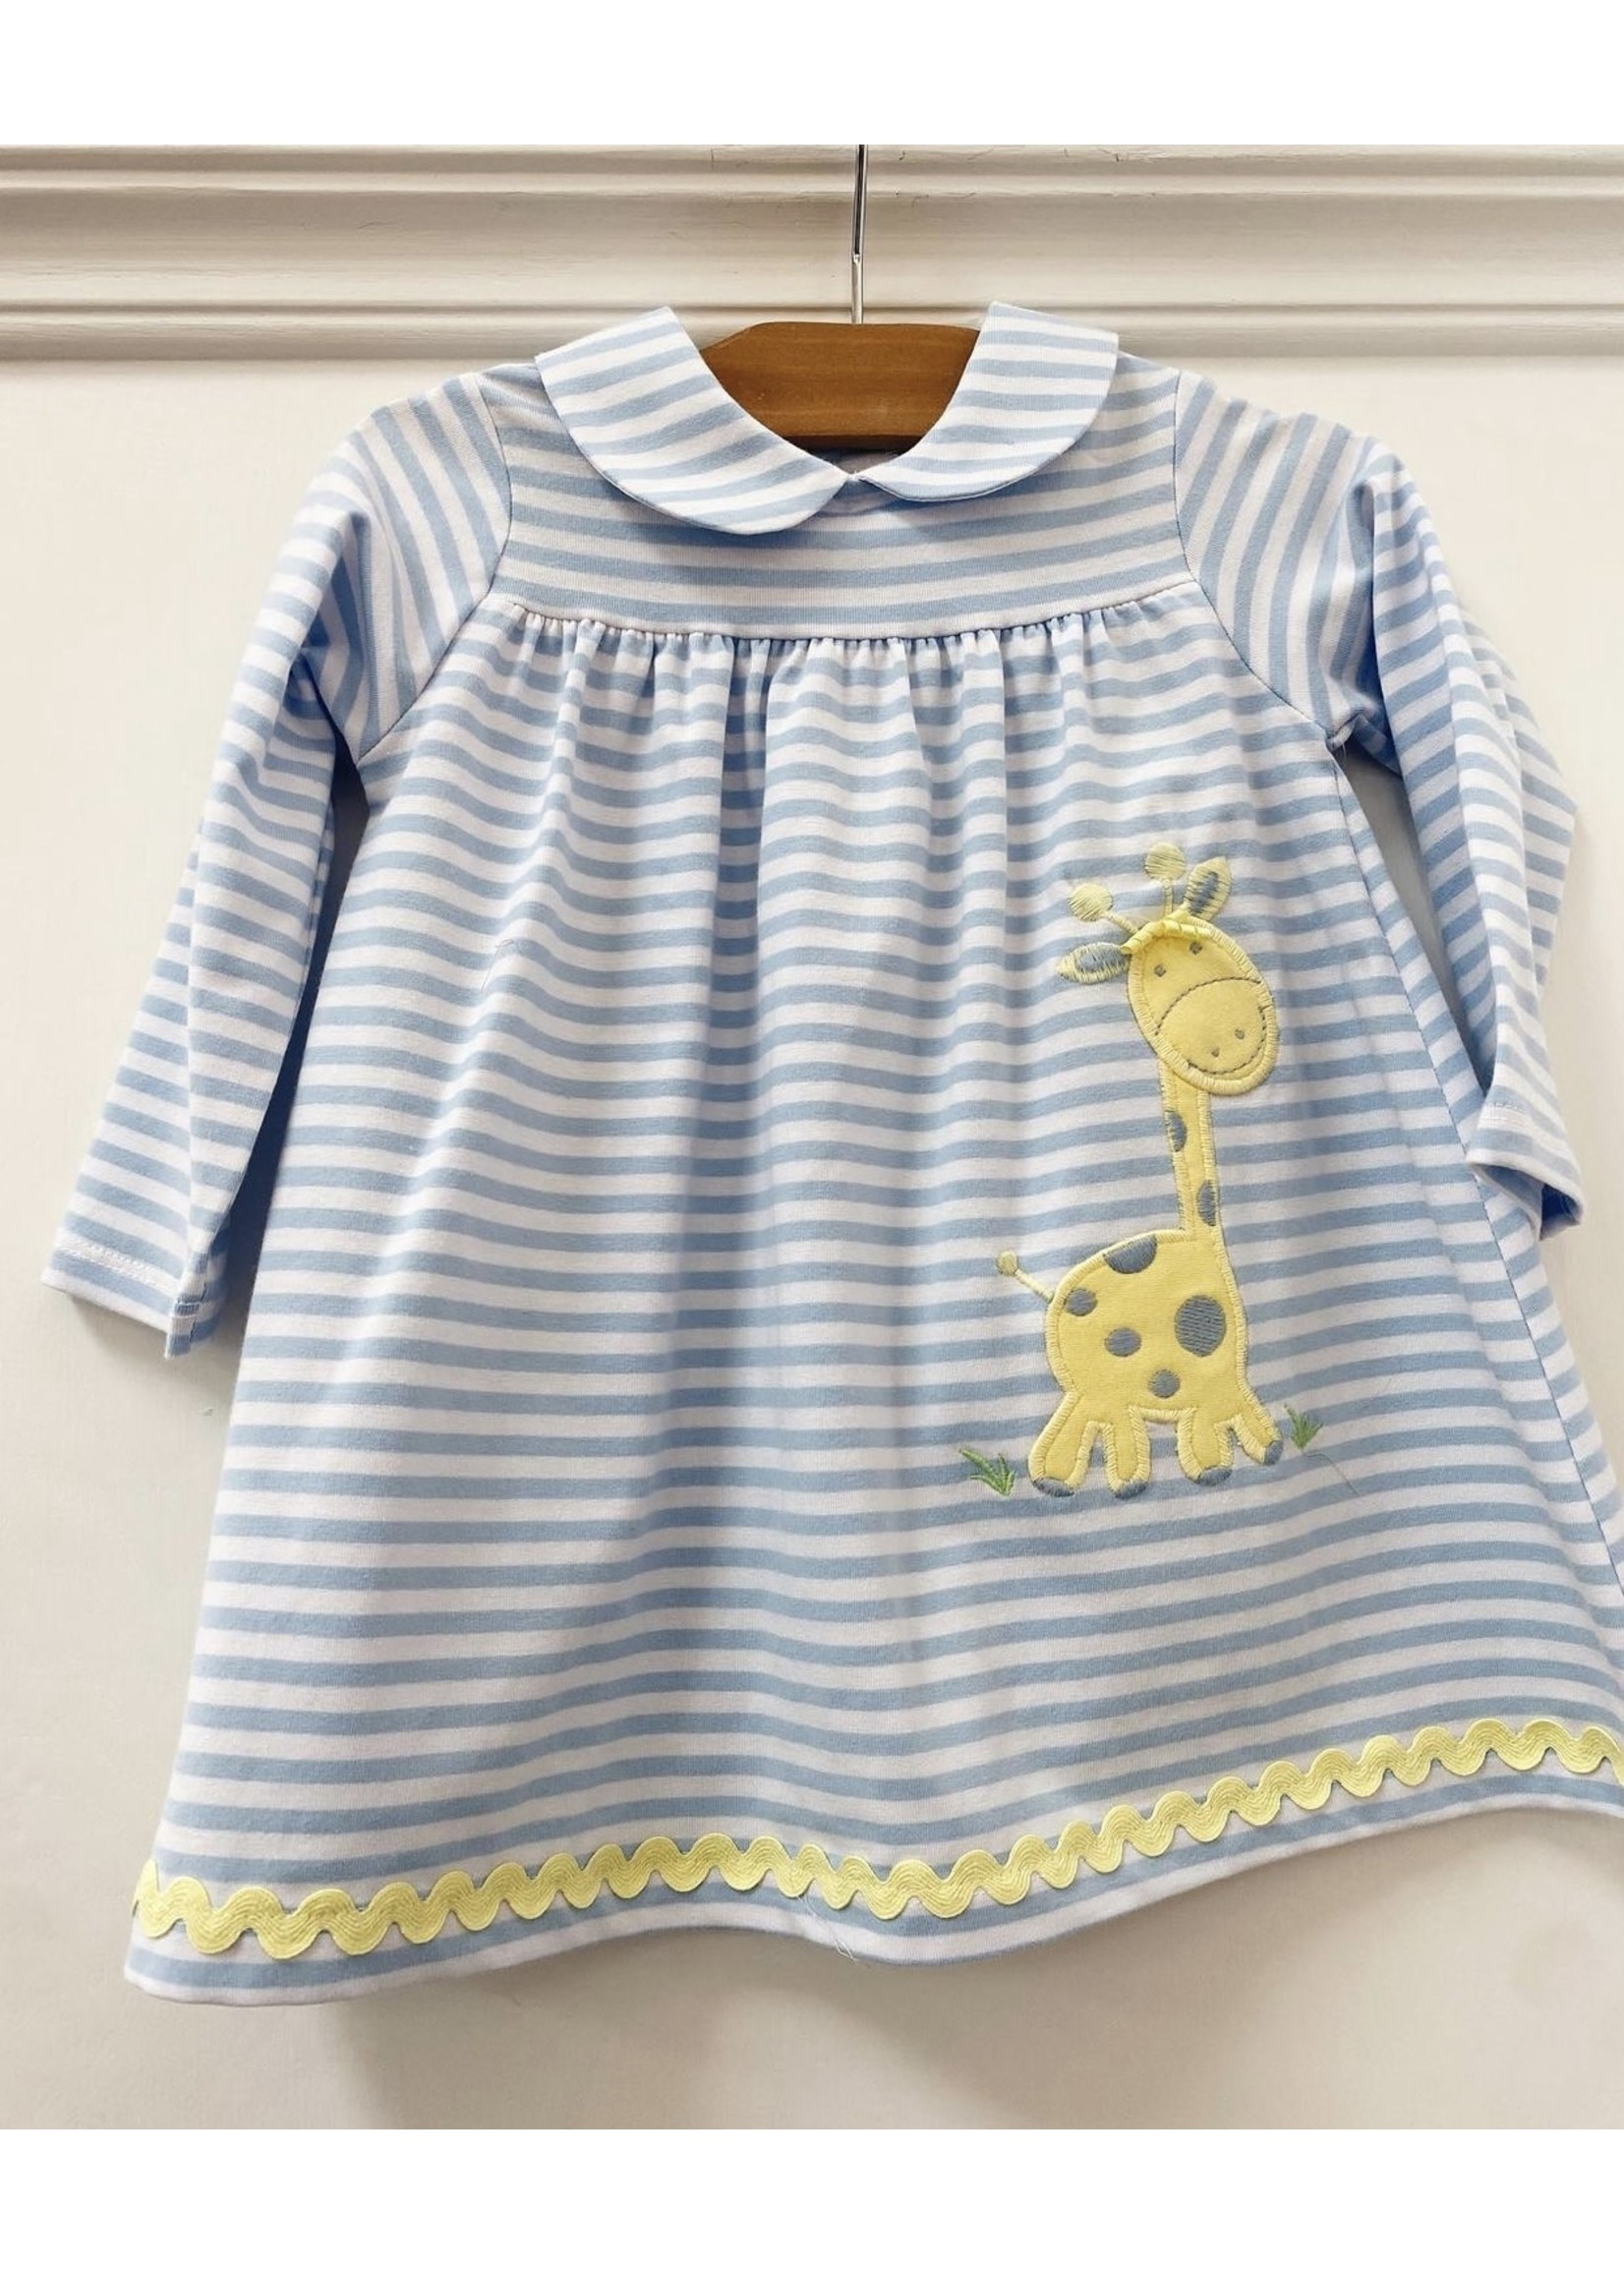 Bailey Boys Gentle Giraffe Knit Dress w/ collar